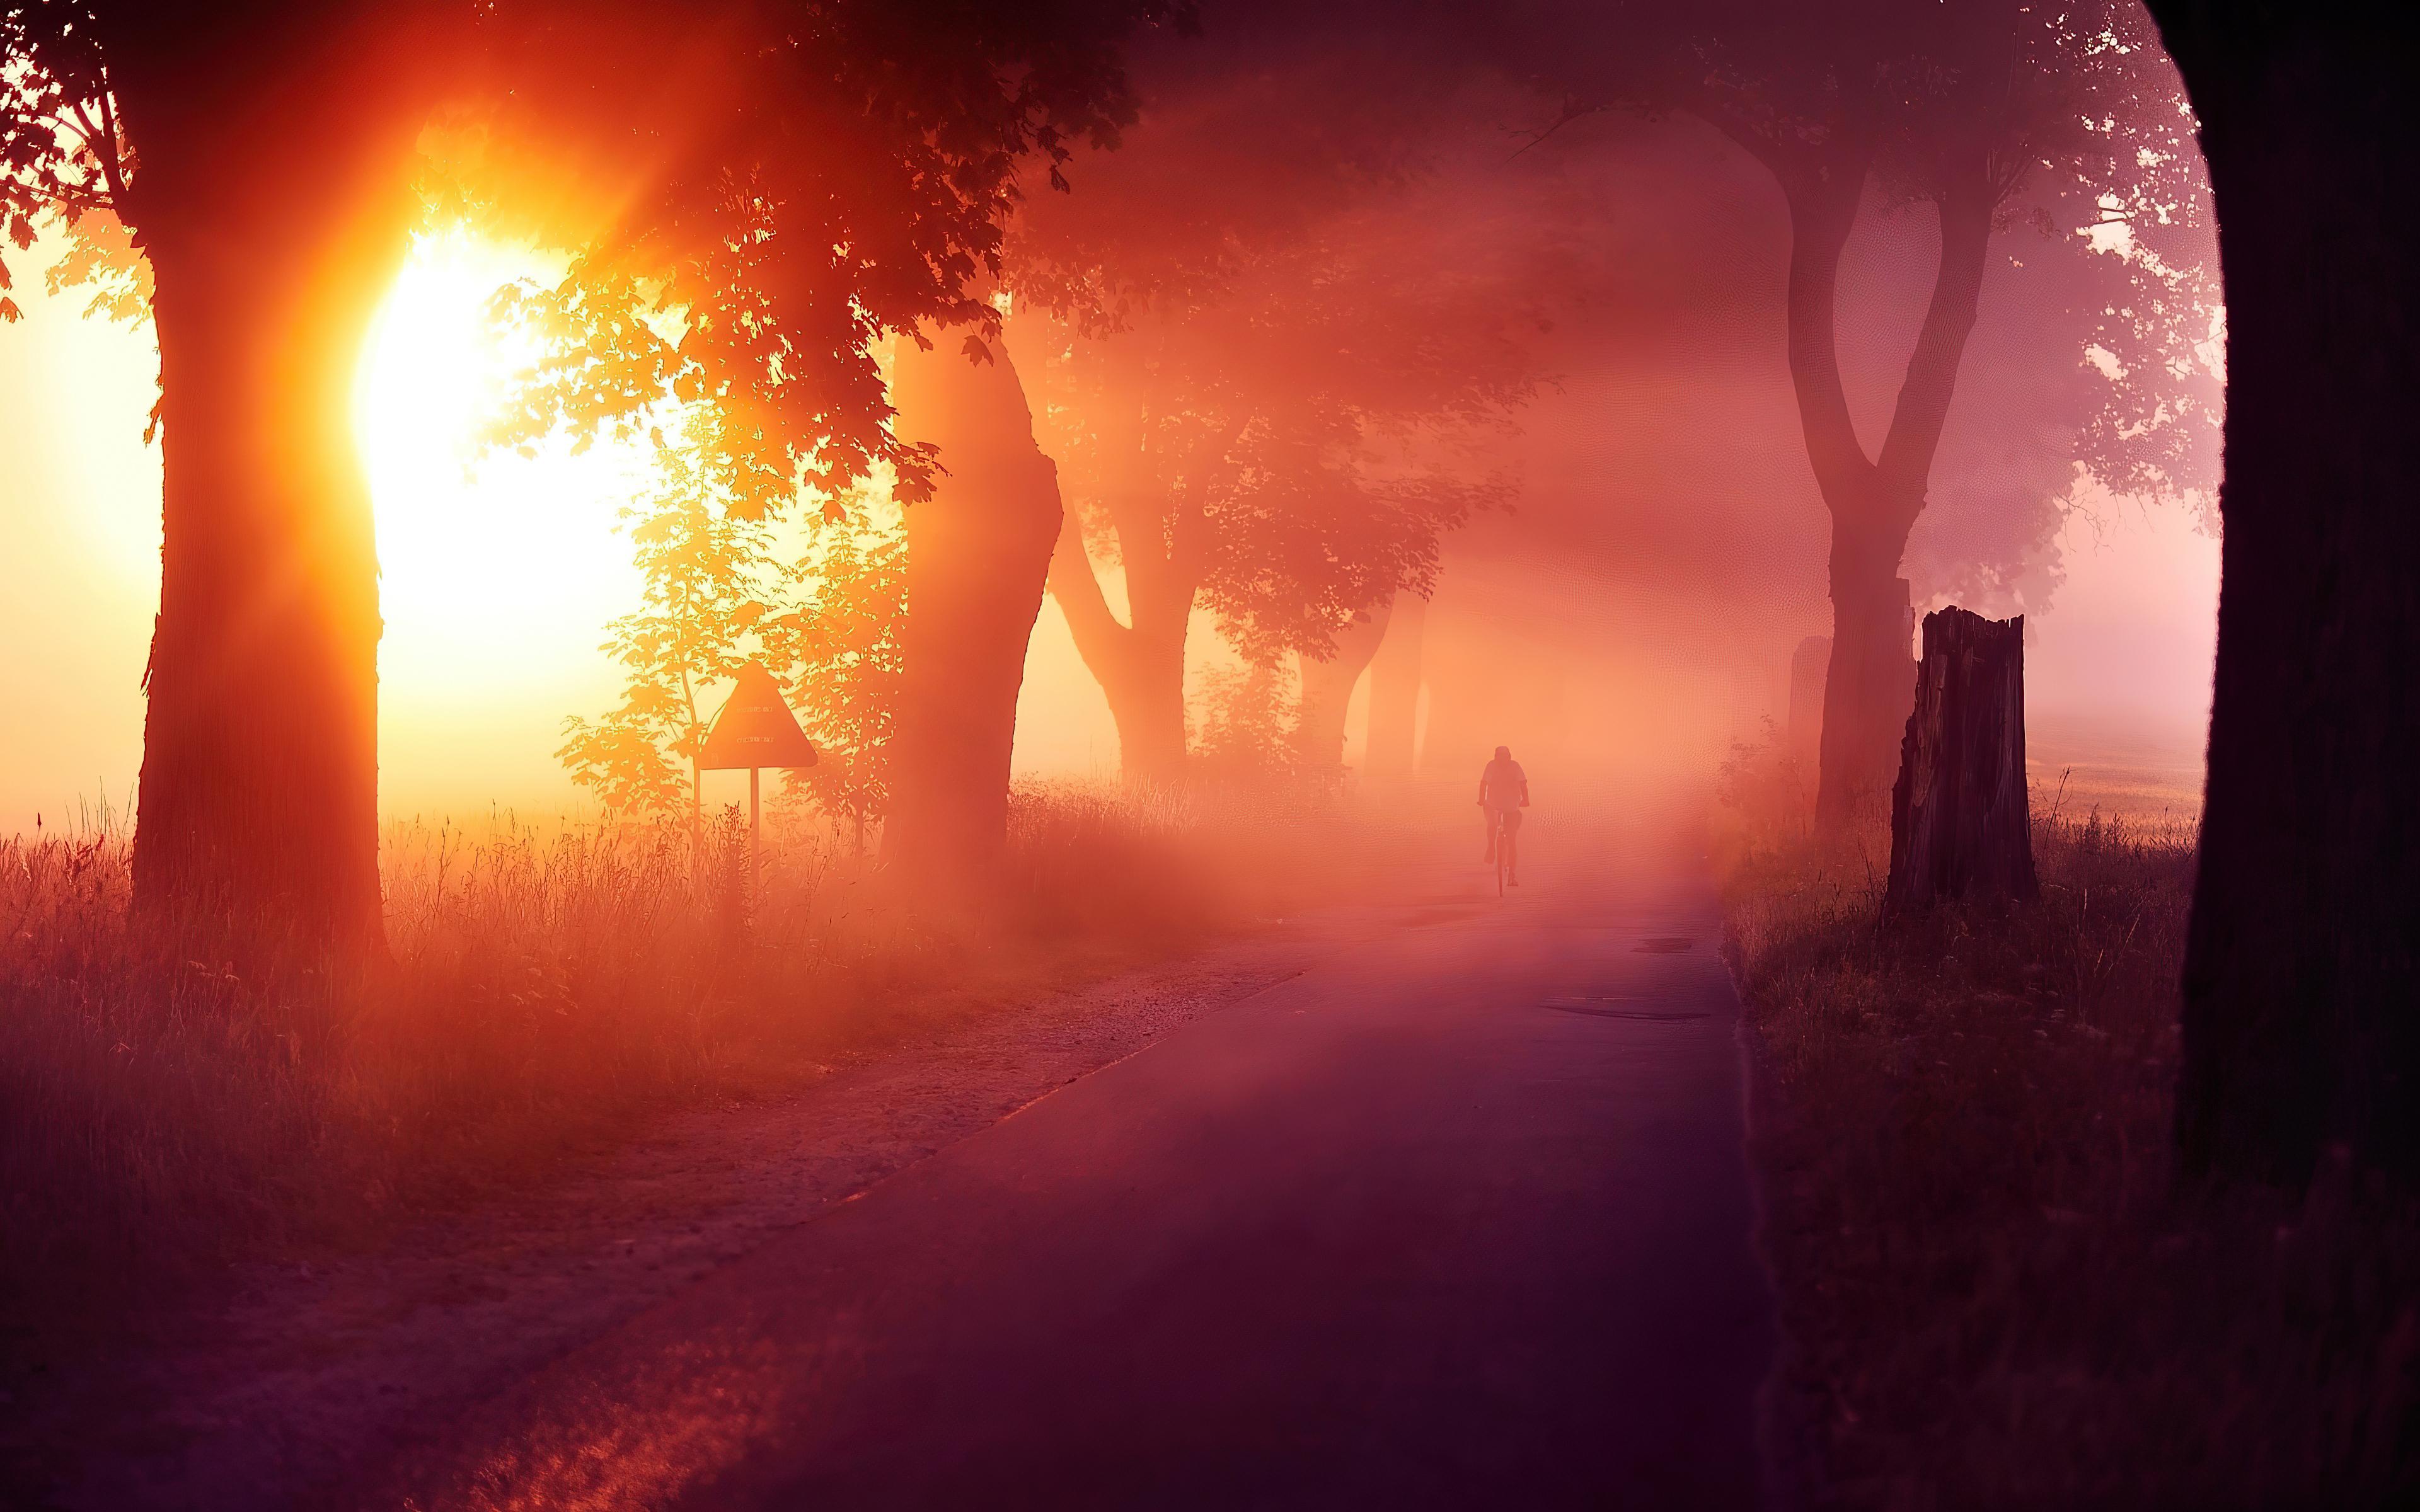 sun rays mist road 4k 1602504494 - Sun Rays Mist Road 4k - Sun Rays Mist Road 4k wallpapers